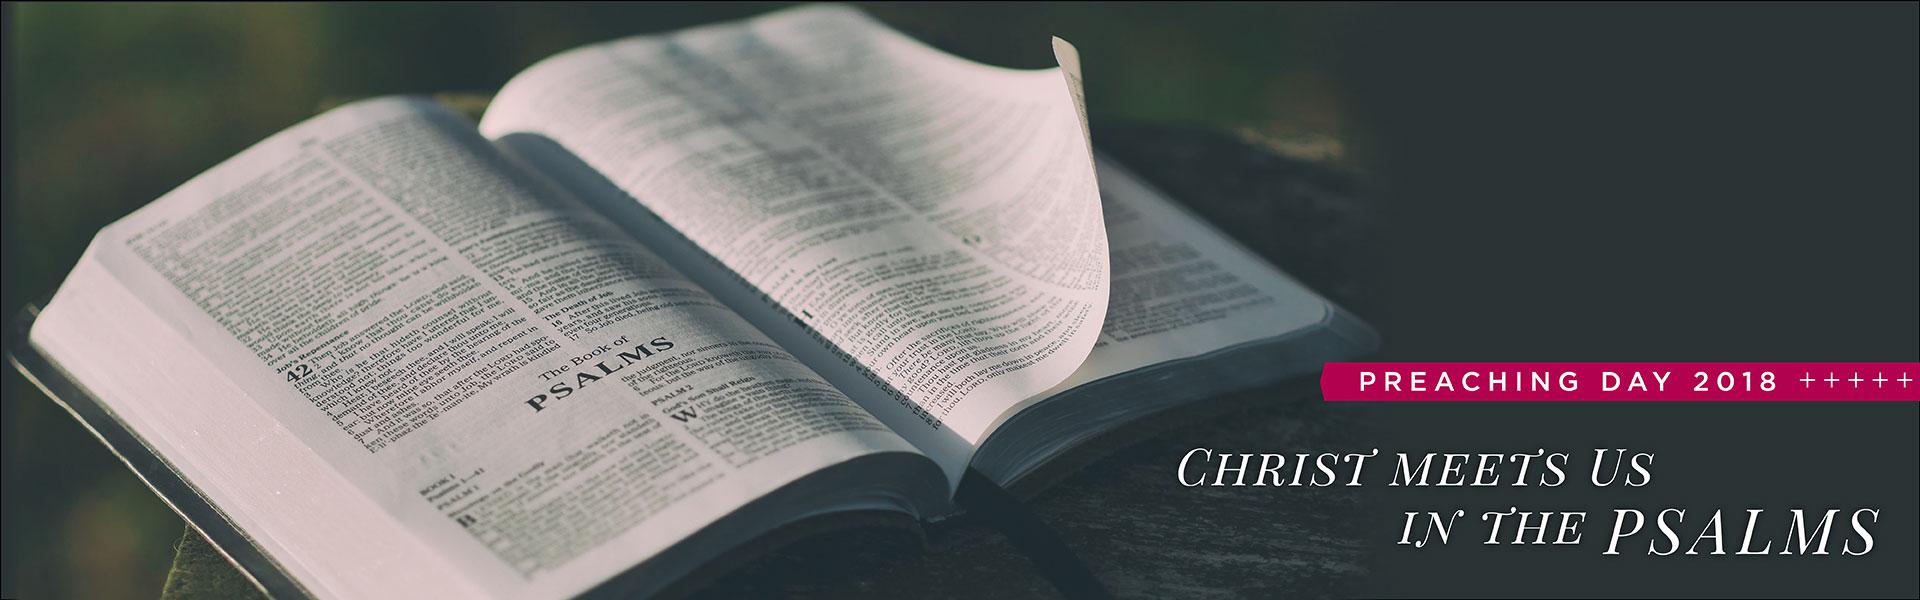 Preaching Day 2018